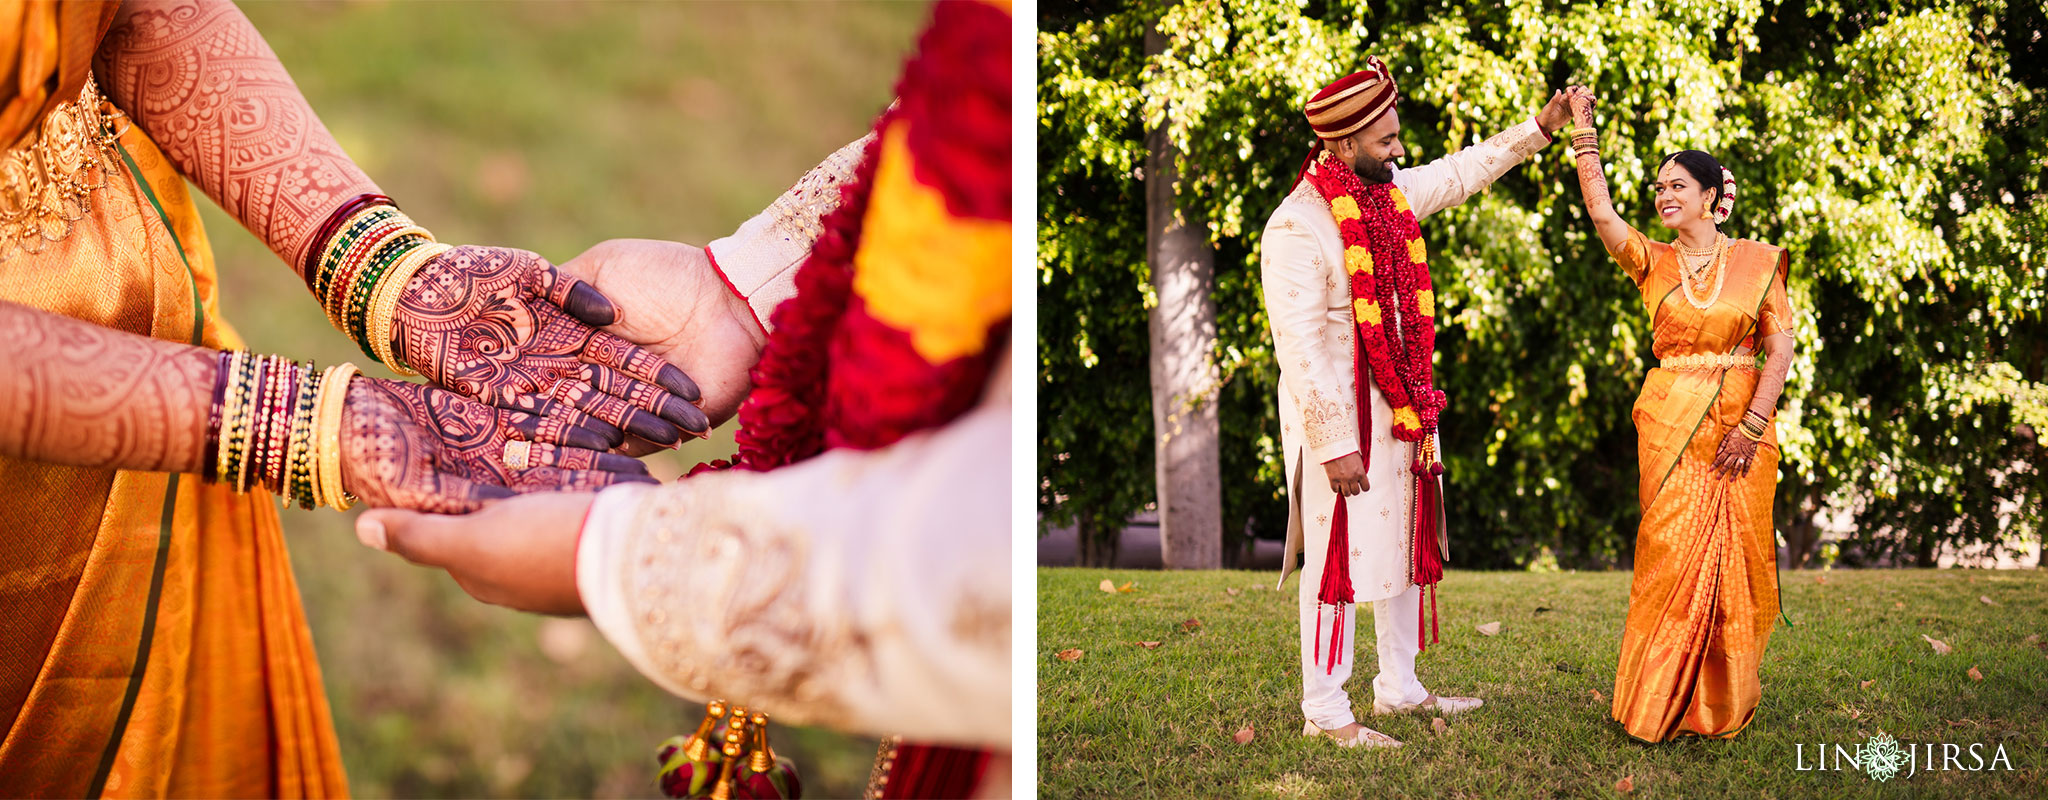 11 long beach hyatt south indian wedding photography